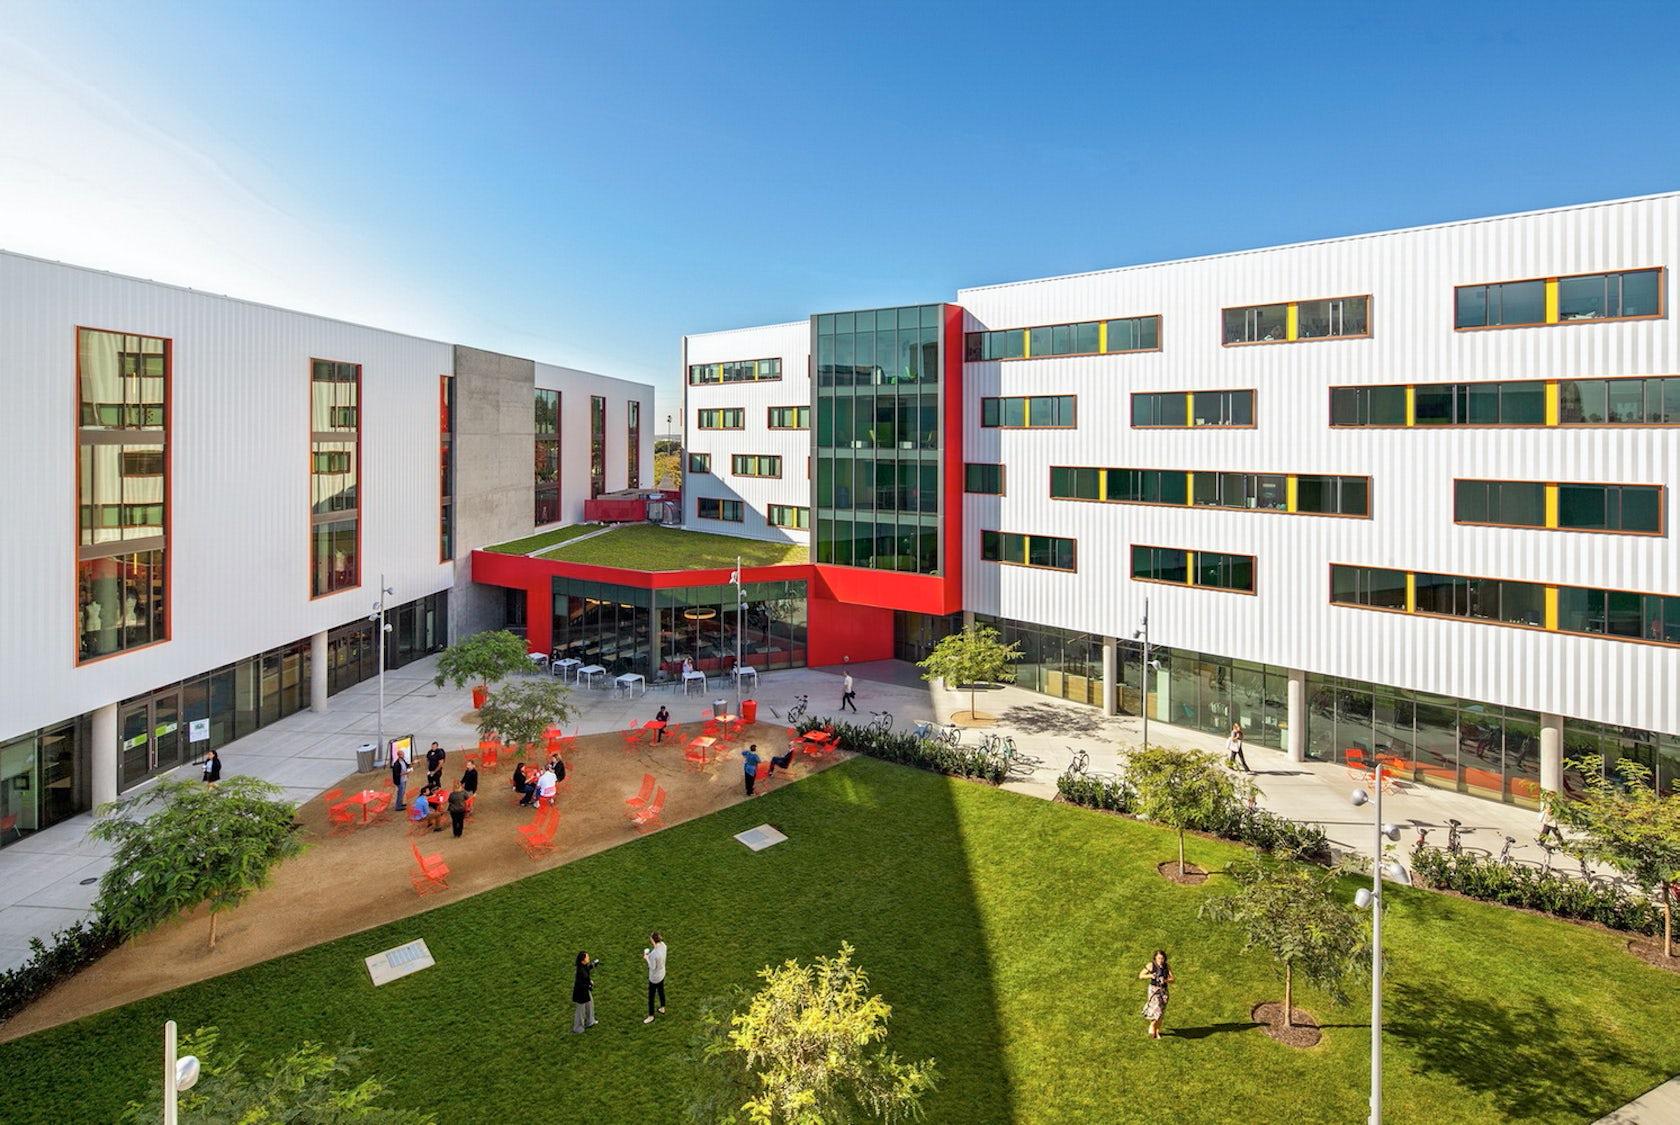 otis college campus virtual award tour expansion architizer winners lets everyone visit entrance university building california